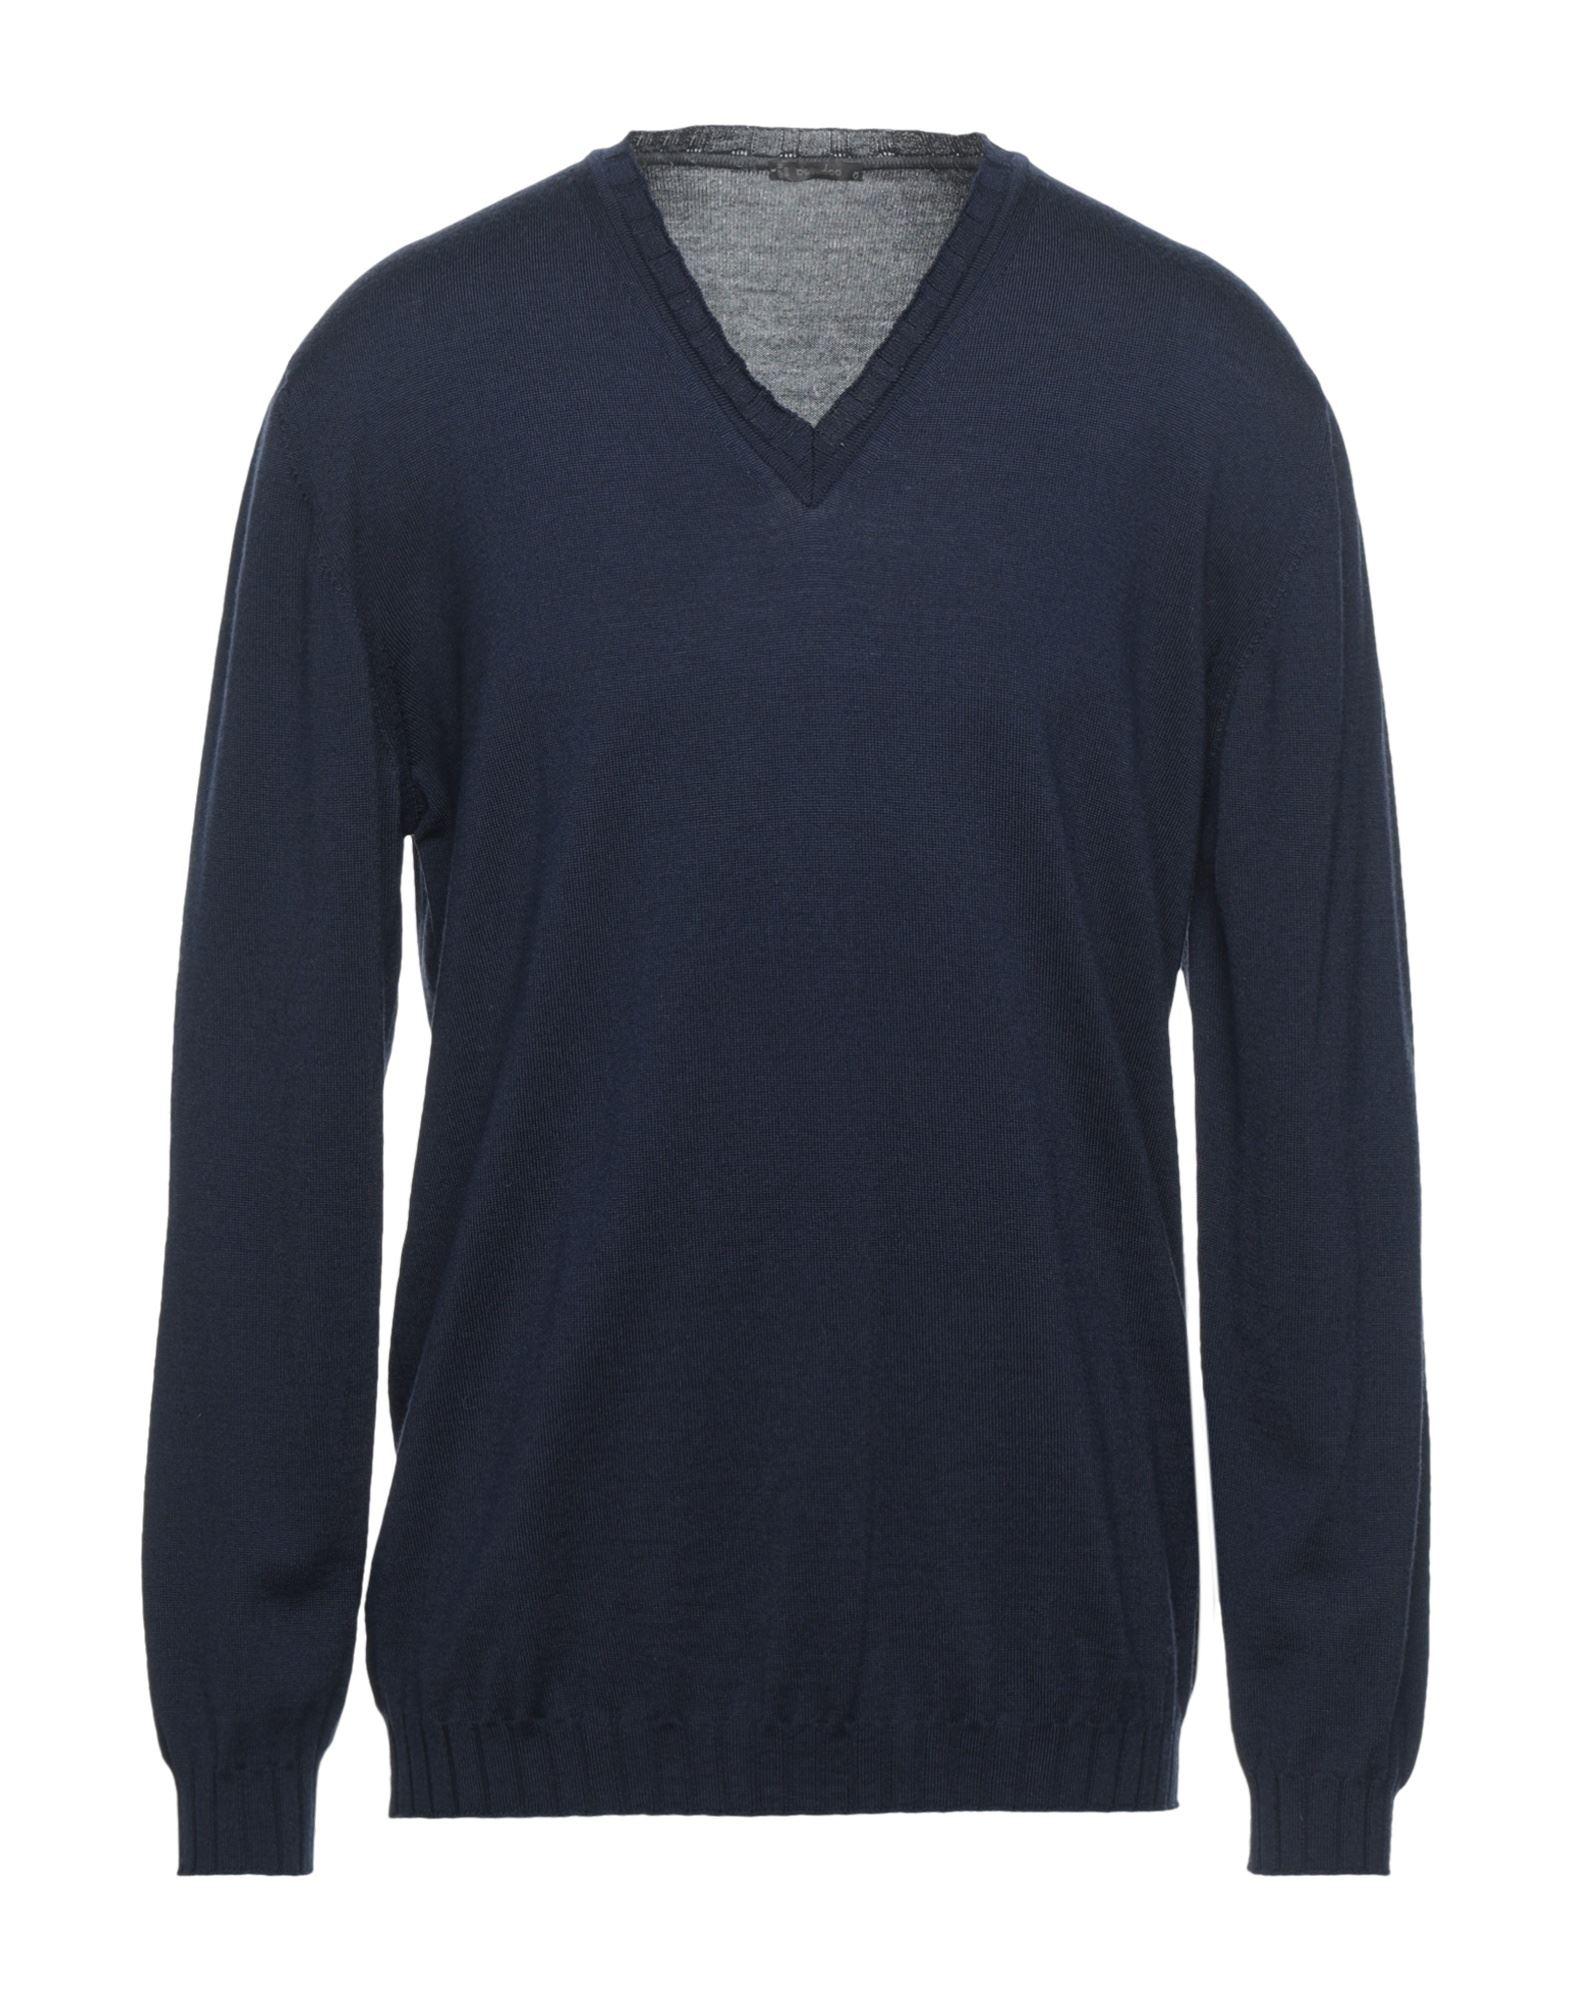 bellwood свитер BELLWOOD Свитер